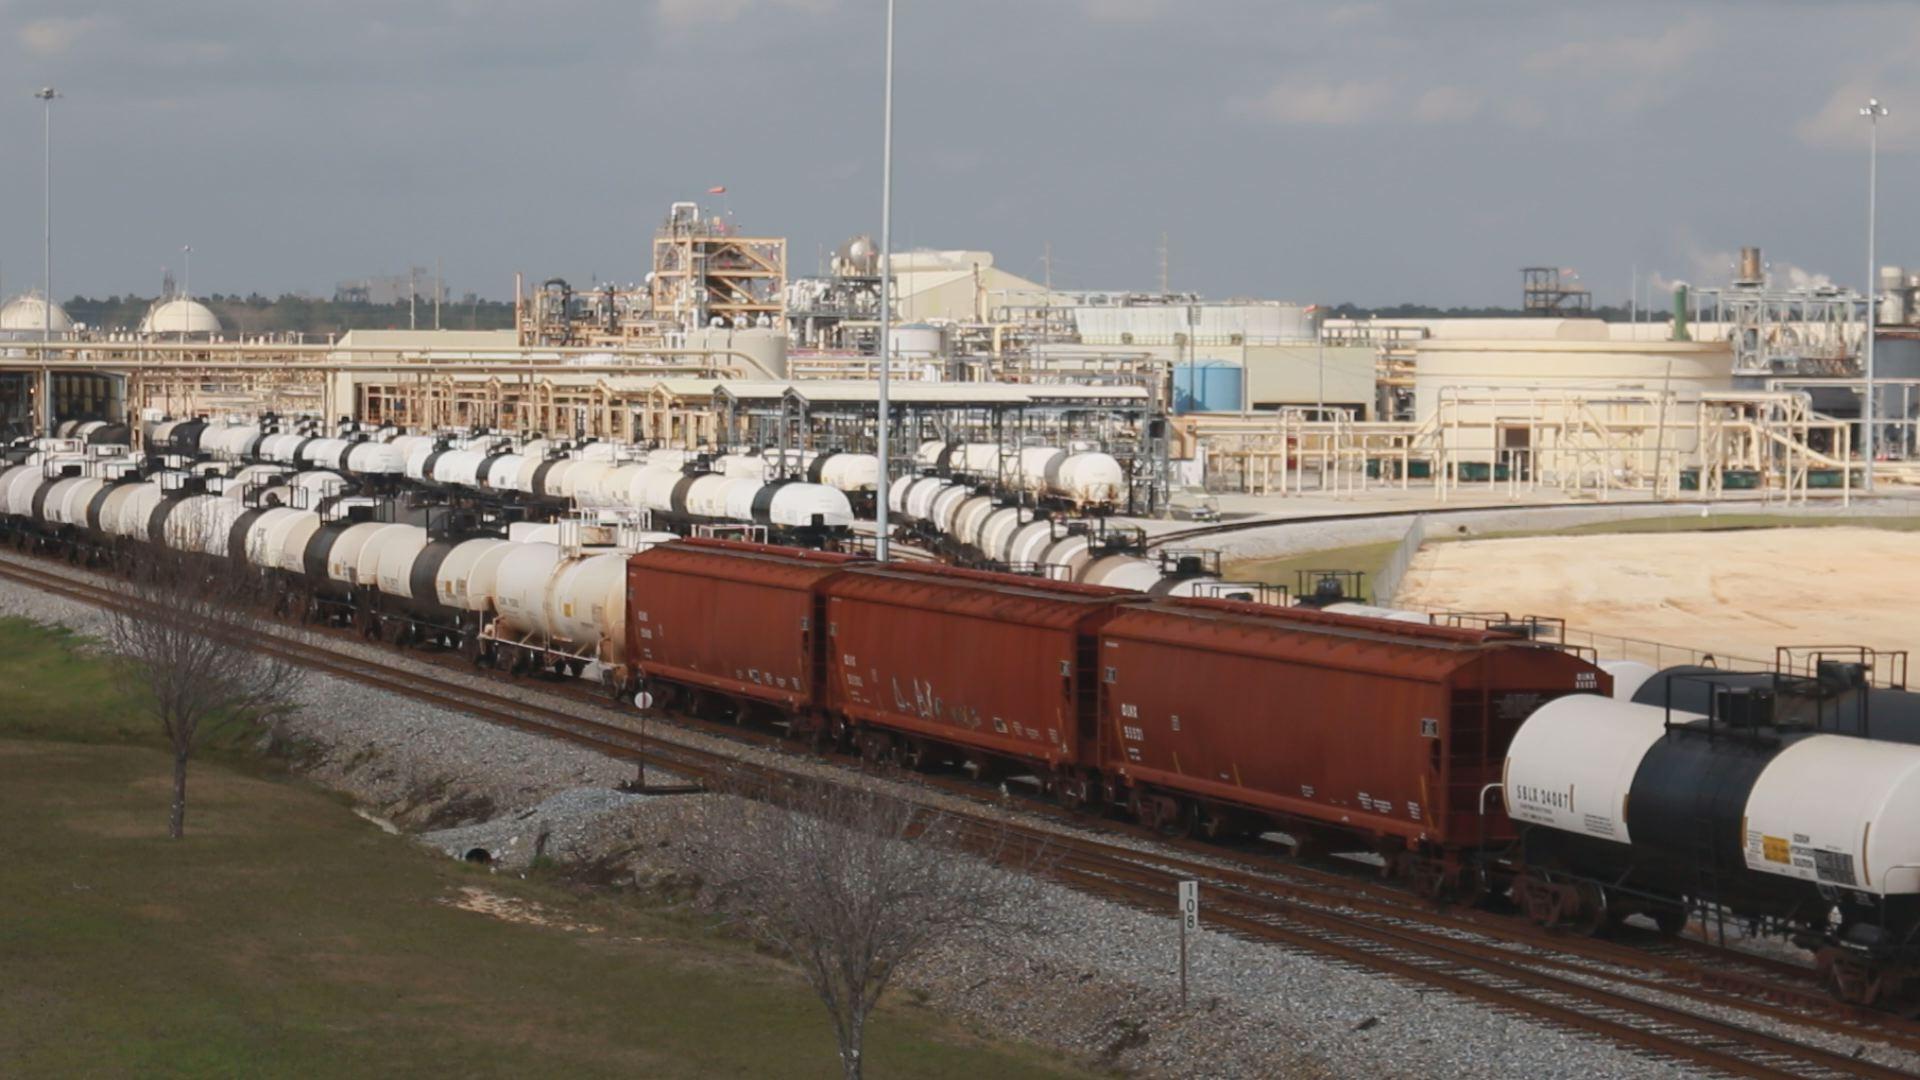 Olin Chlor Alkali Products facility in McIntosh, Ala. (Credit: Franz Barraza, Chief Photographer, WALA FOX10 News)